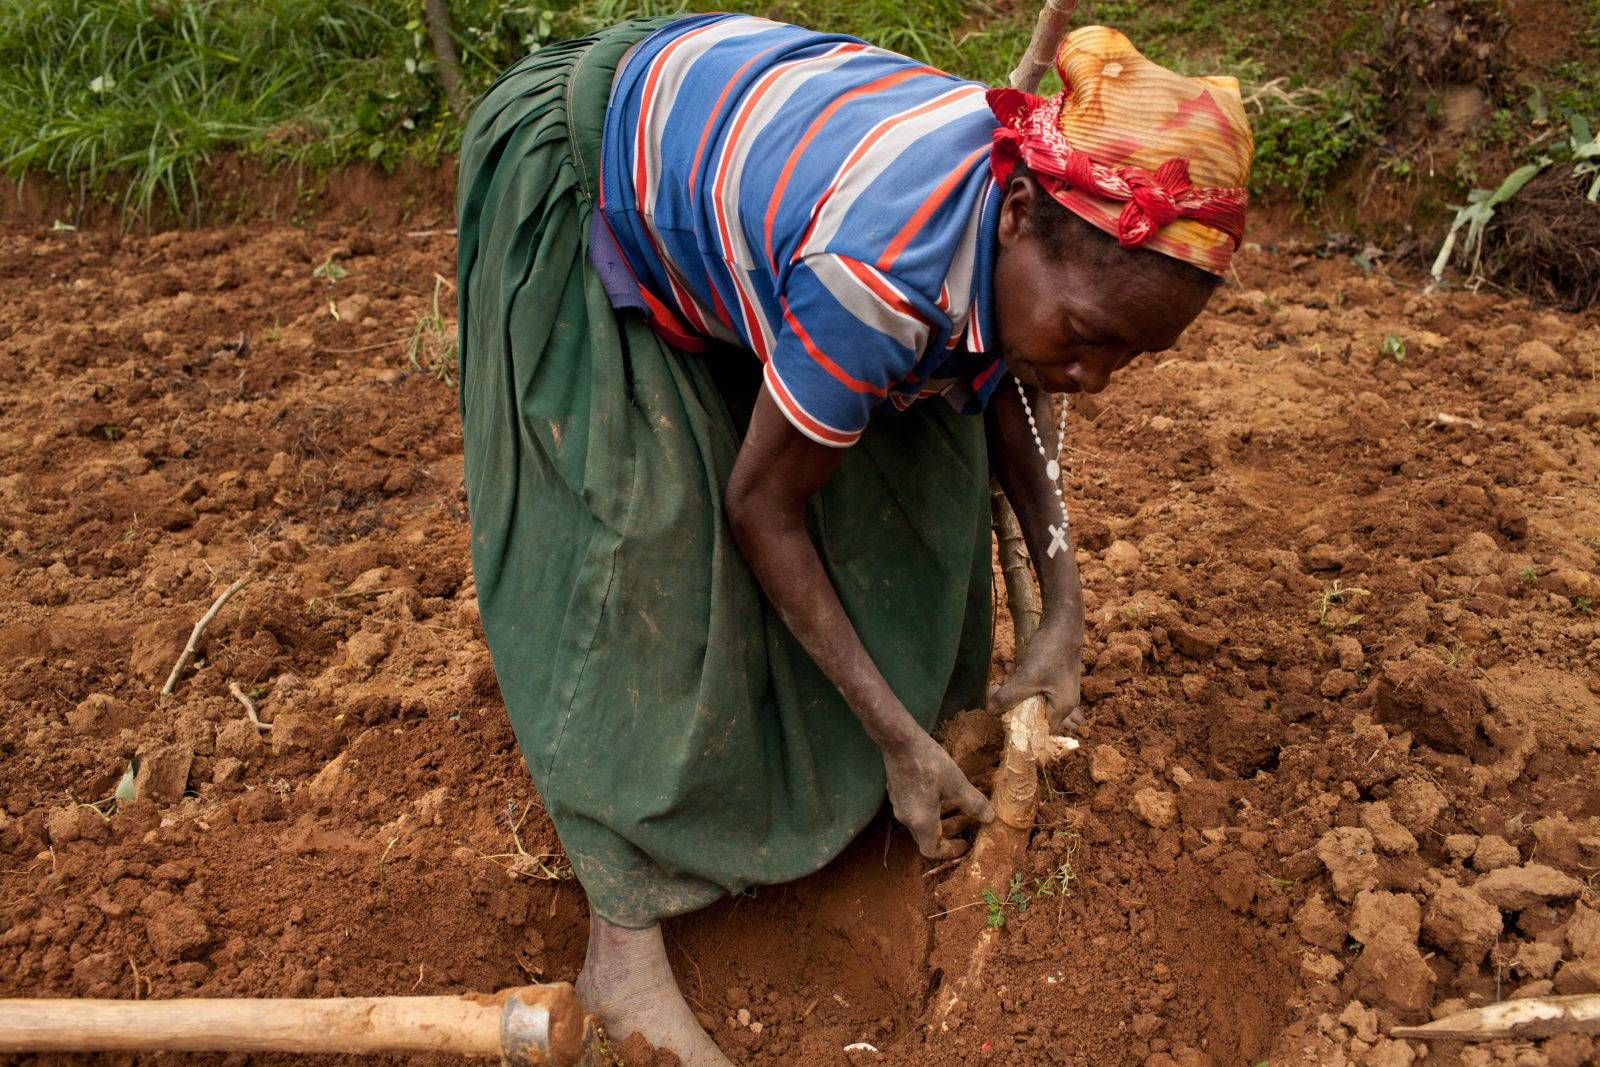 Rwanda-DSM-Michael Rhebergen_small-Srgb-07